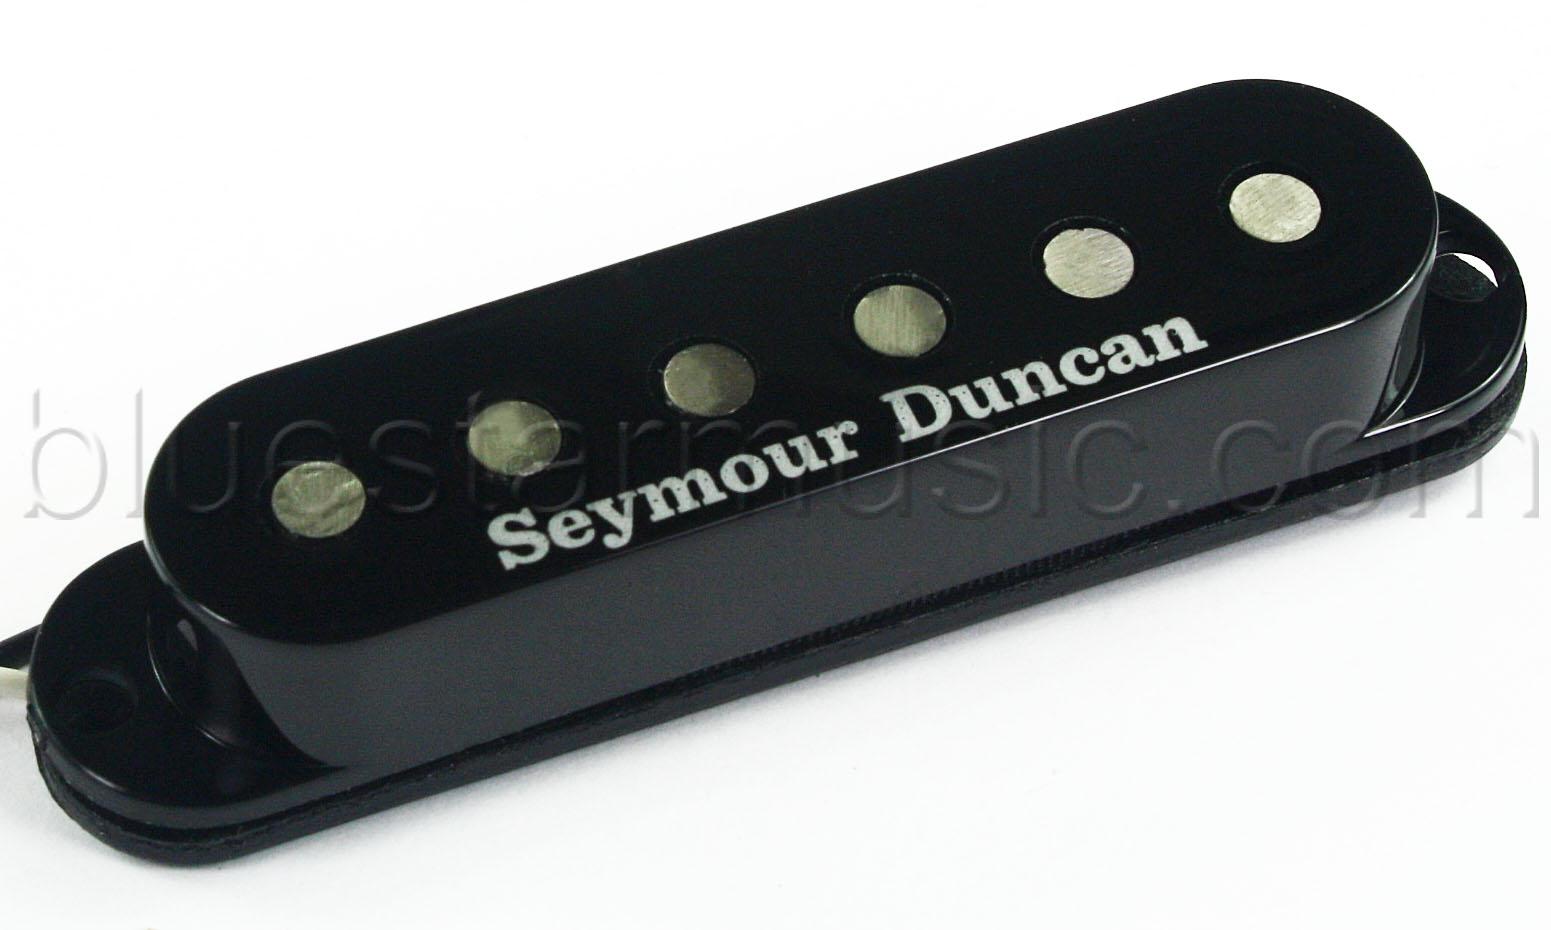 Seymour Duncan Ssl Bridge Pickup  Black